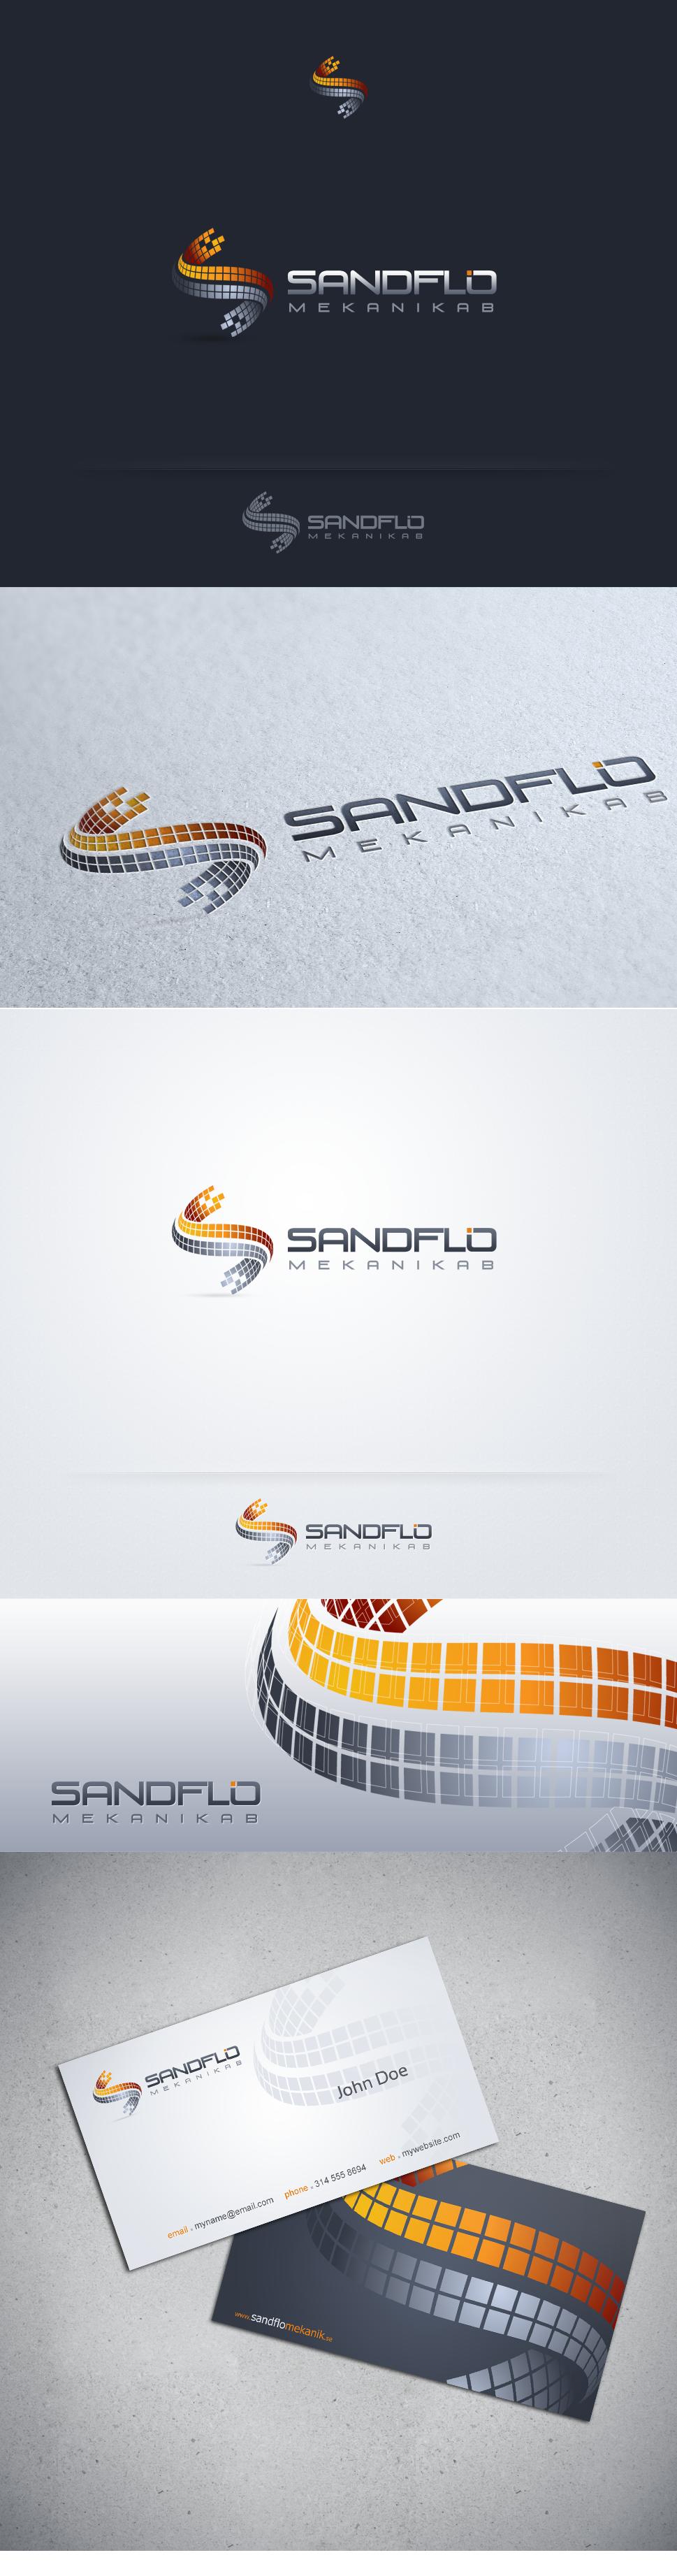 New logo wanted for Sandflo Mekanik AB